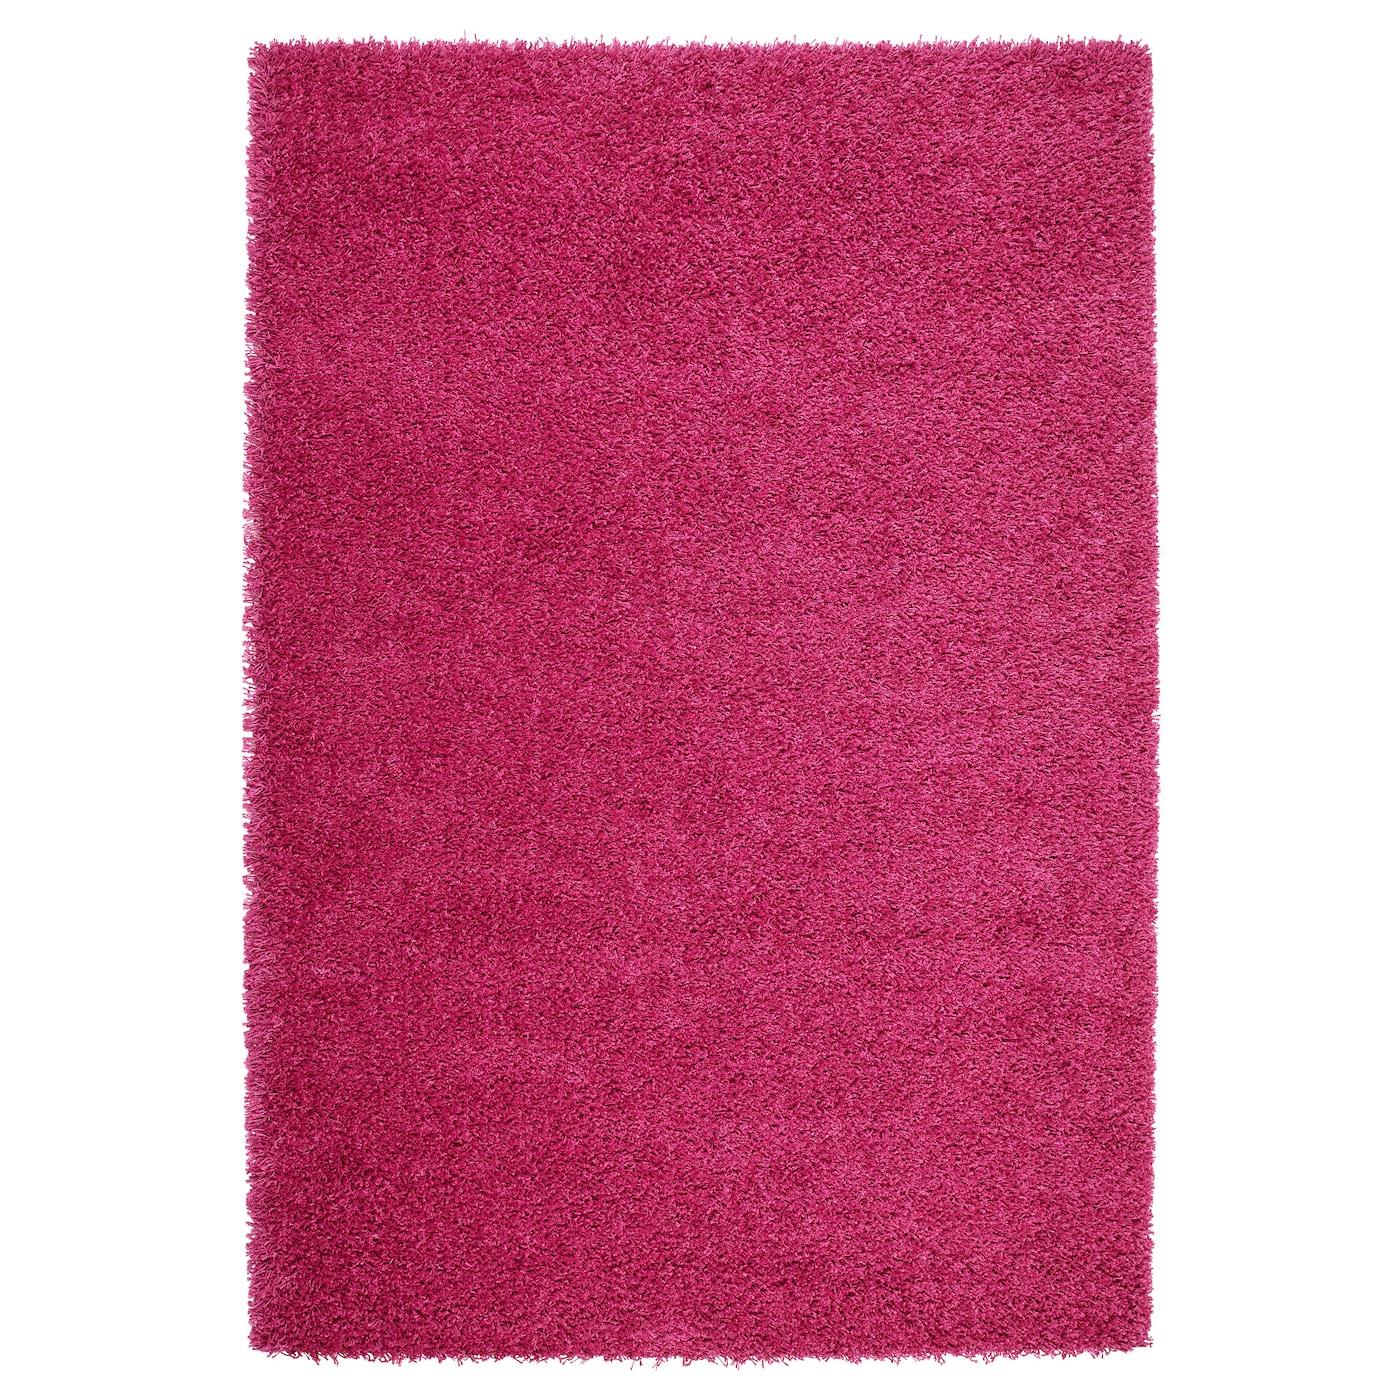 Tapis Moyen Et Grand IKEA - Carrelage salle de bain et tapis rond rouge 160